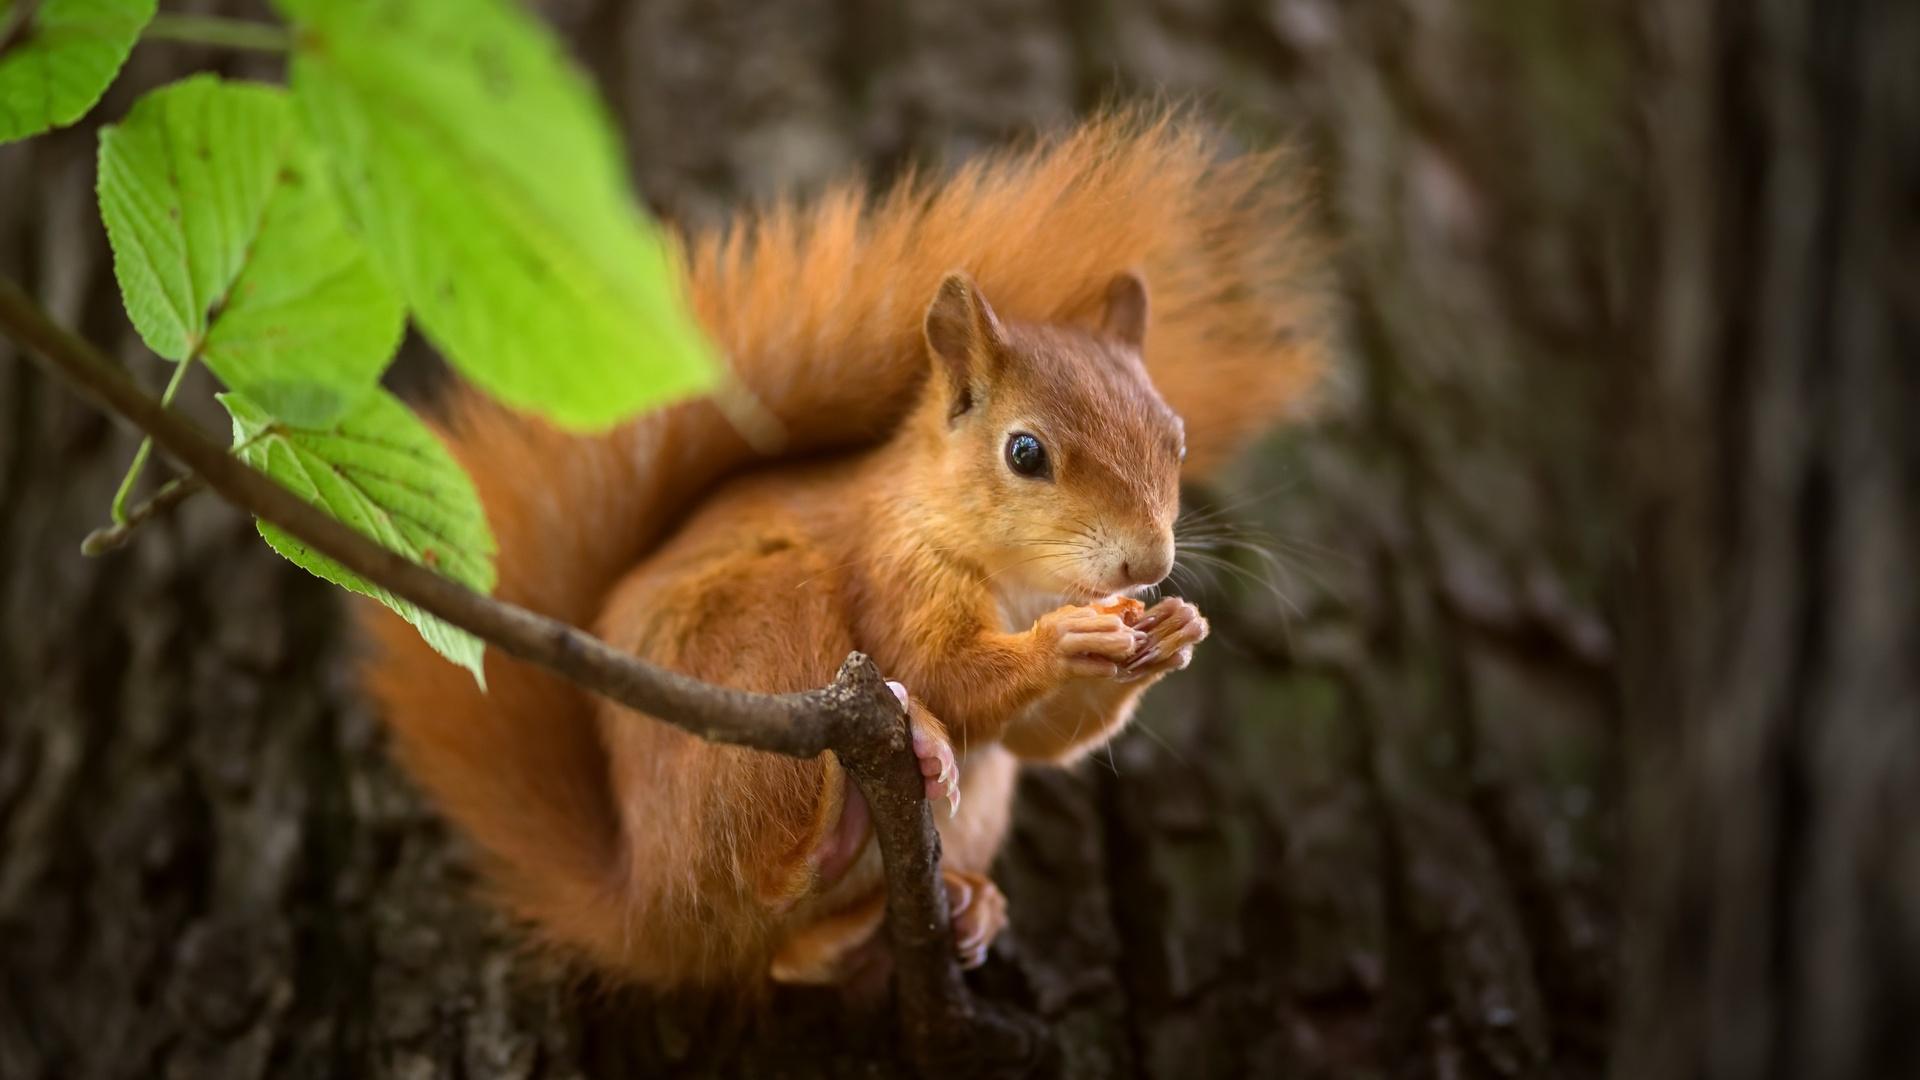 1920x1080 Cute Squirrel Laptop Full HD 1080P HD 4k ... |Indian Squirrel Wallpaper